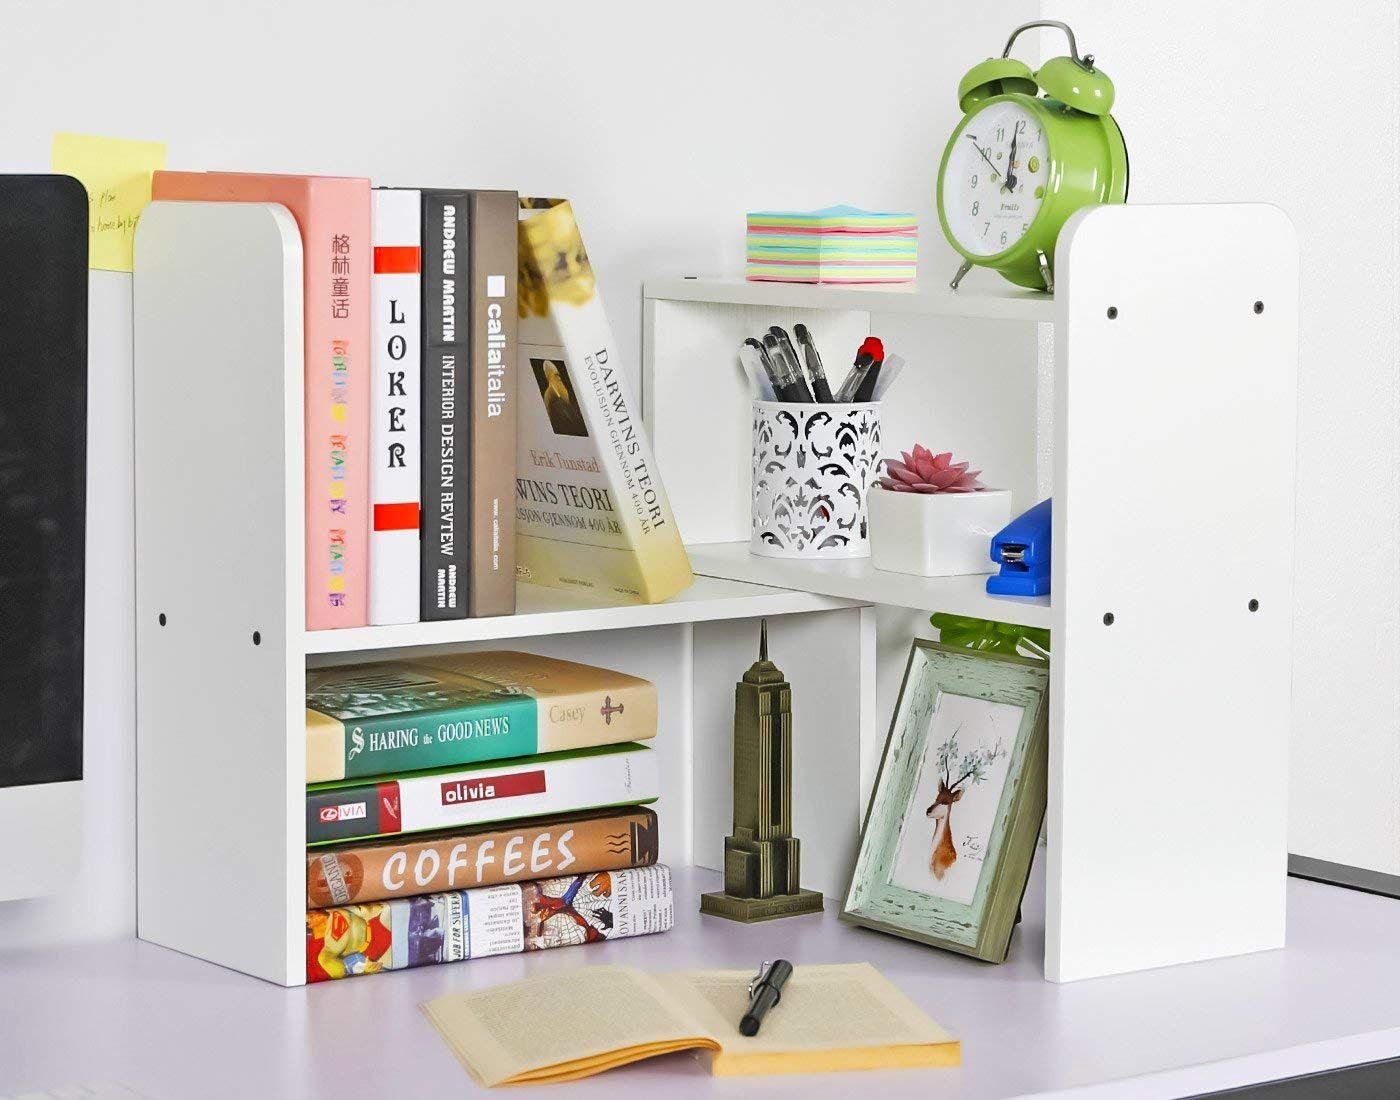 Desktop Bookshelf Adjustable Countertop Bookcase Office Supplies Wood Desk Organizer Accessories Displ Office Supplies Wood Desktop Bookshelf Desk Organization